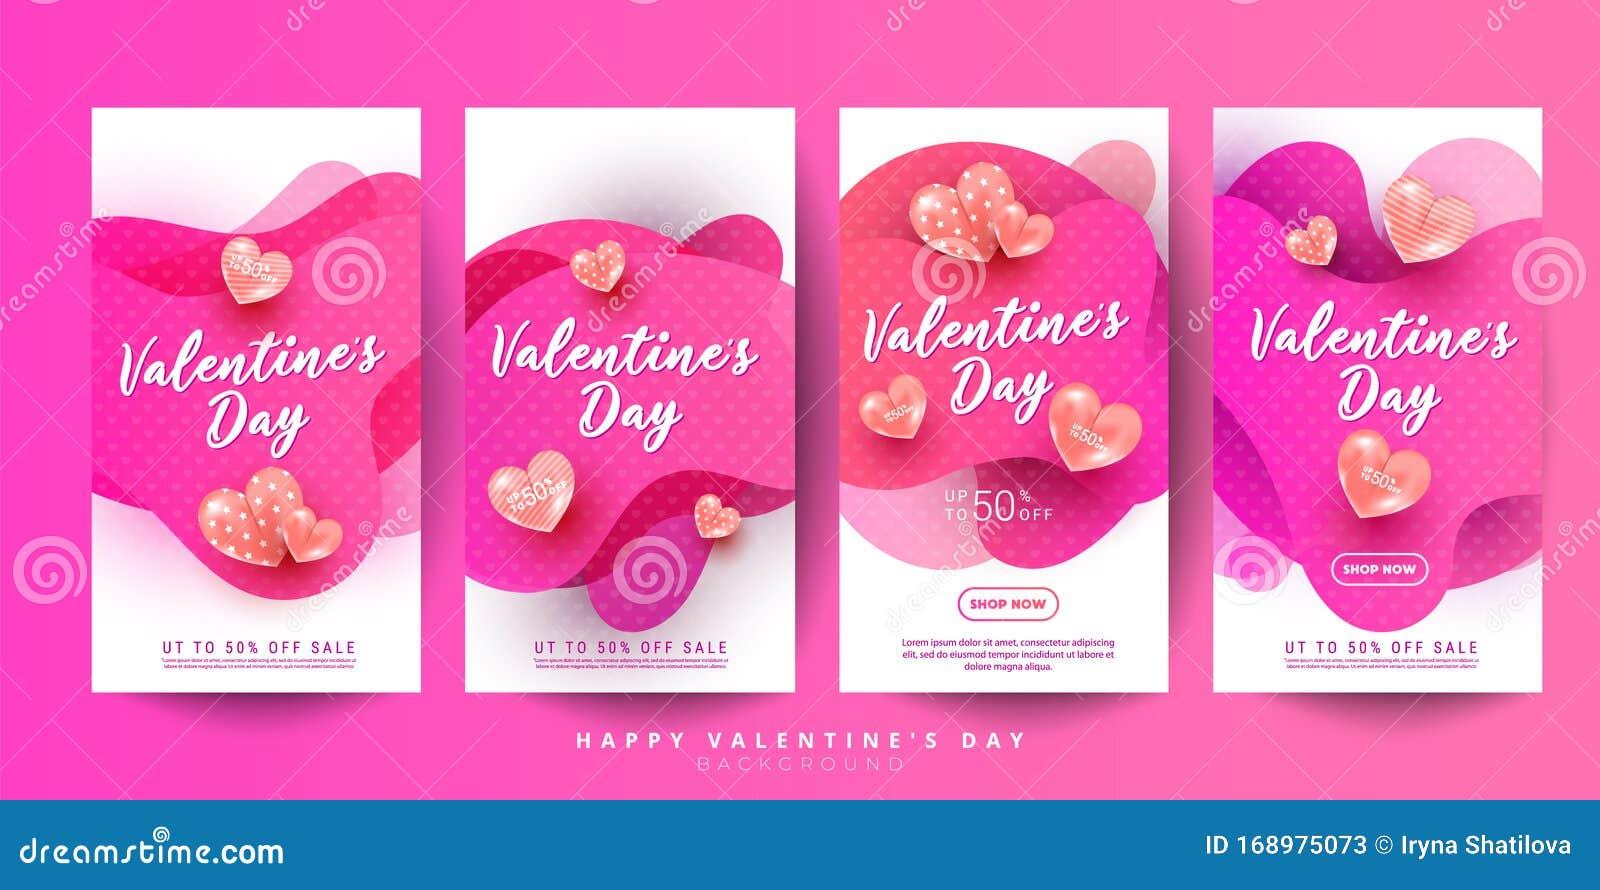 creative greeting cards set of liquid fluid heart shapes